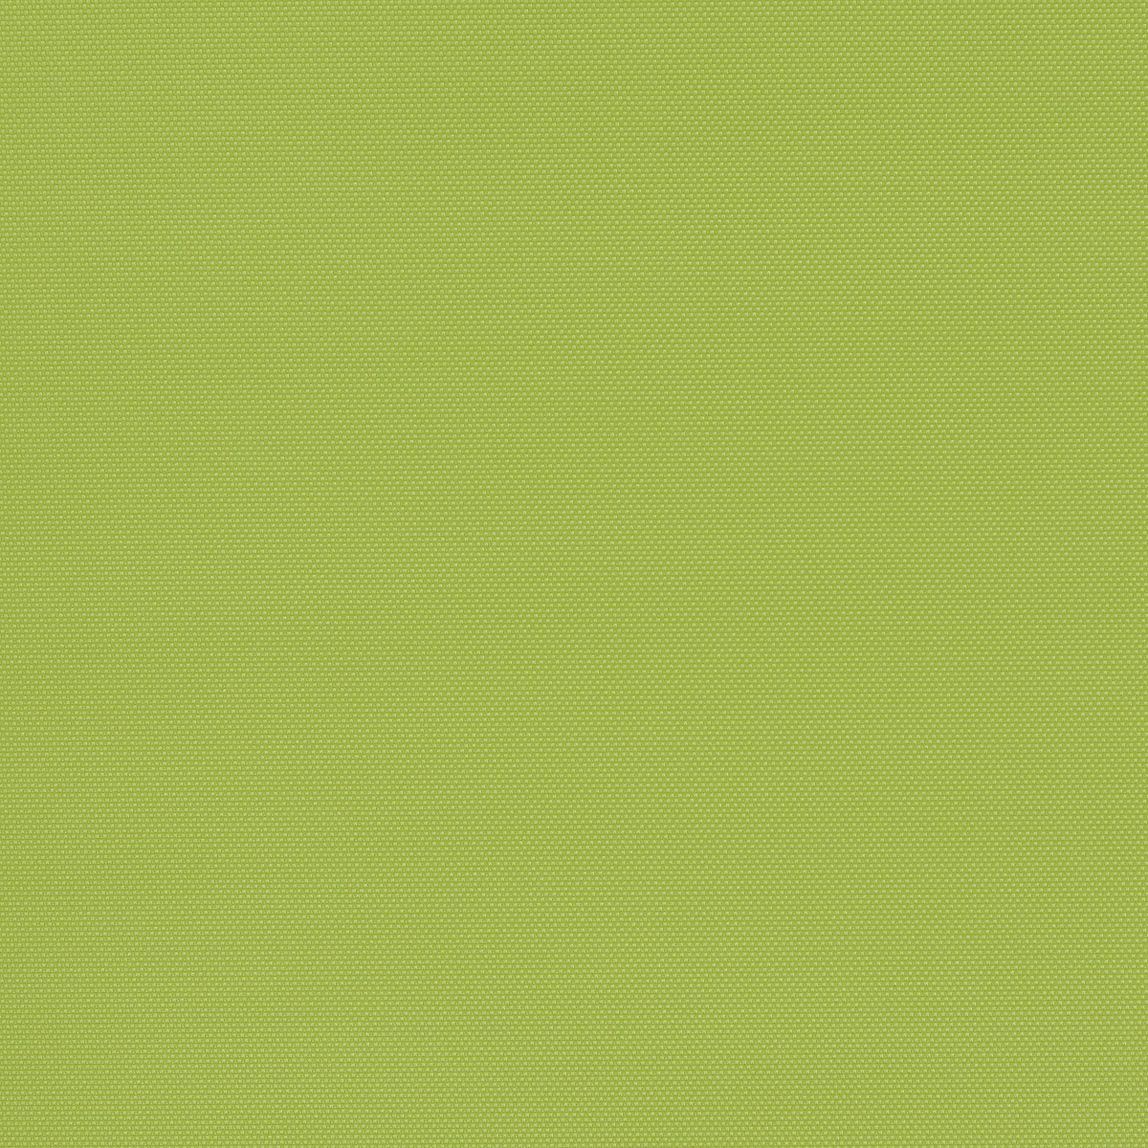 Amplify Parakeet Swatch